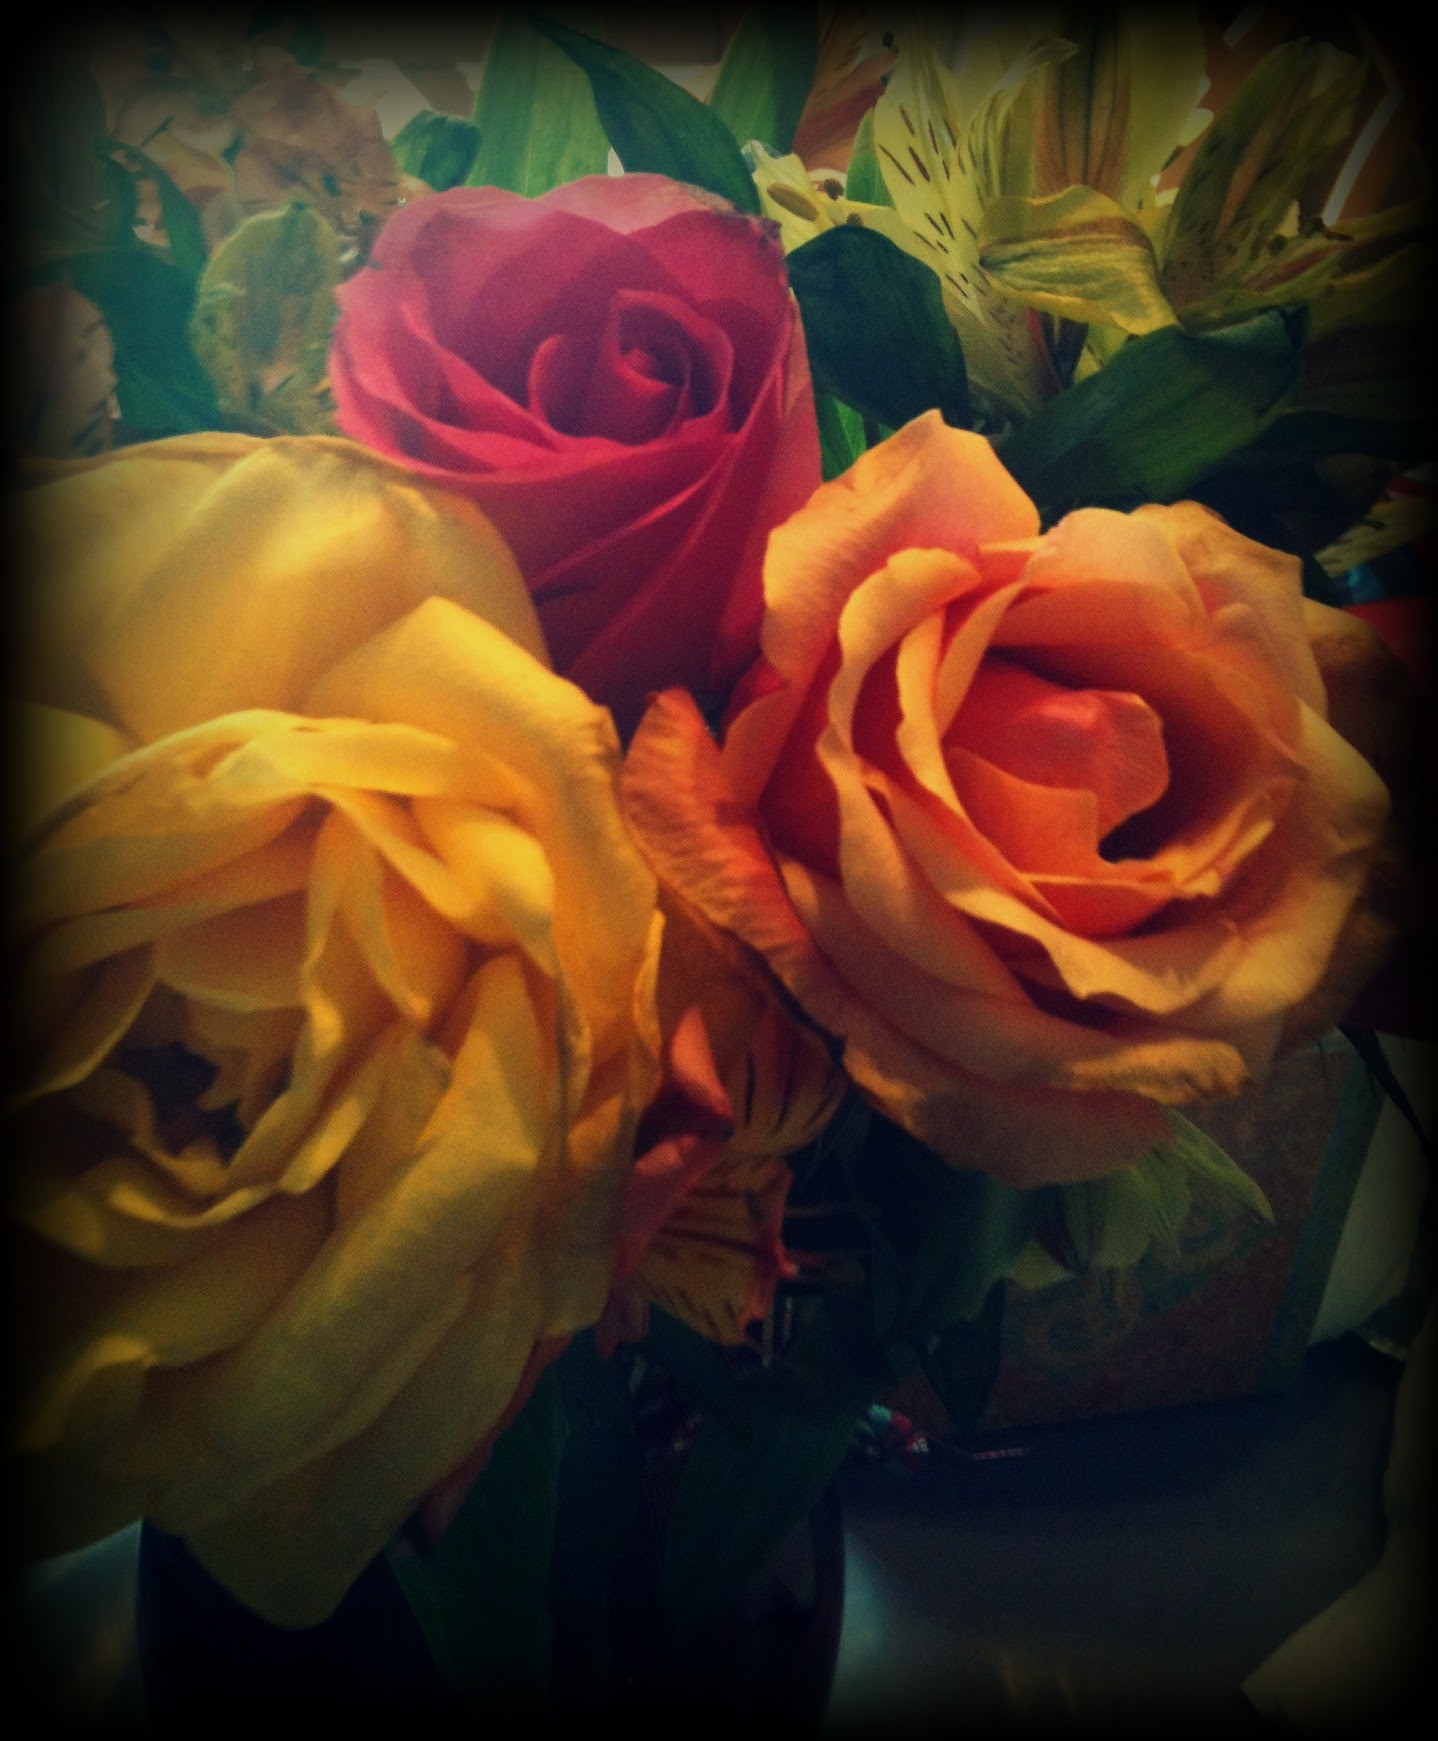 birthday roses edited